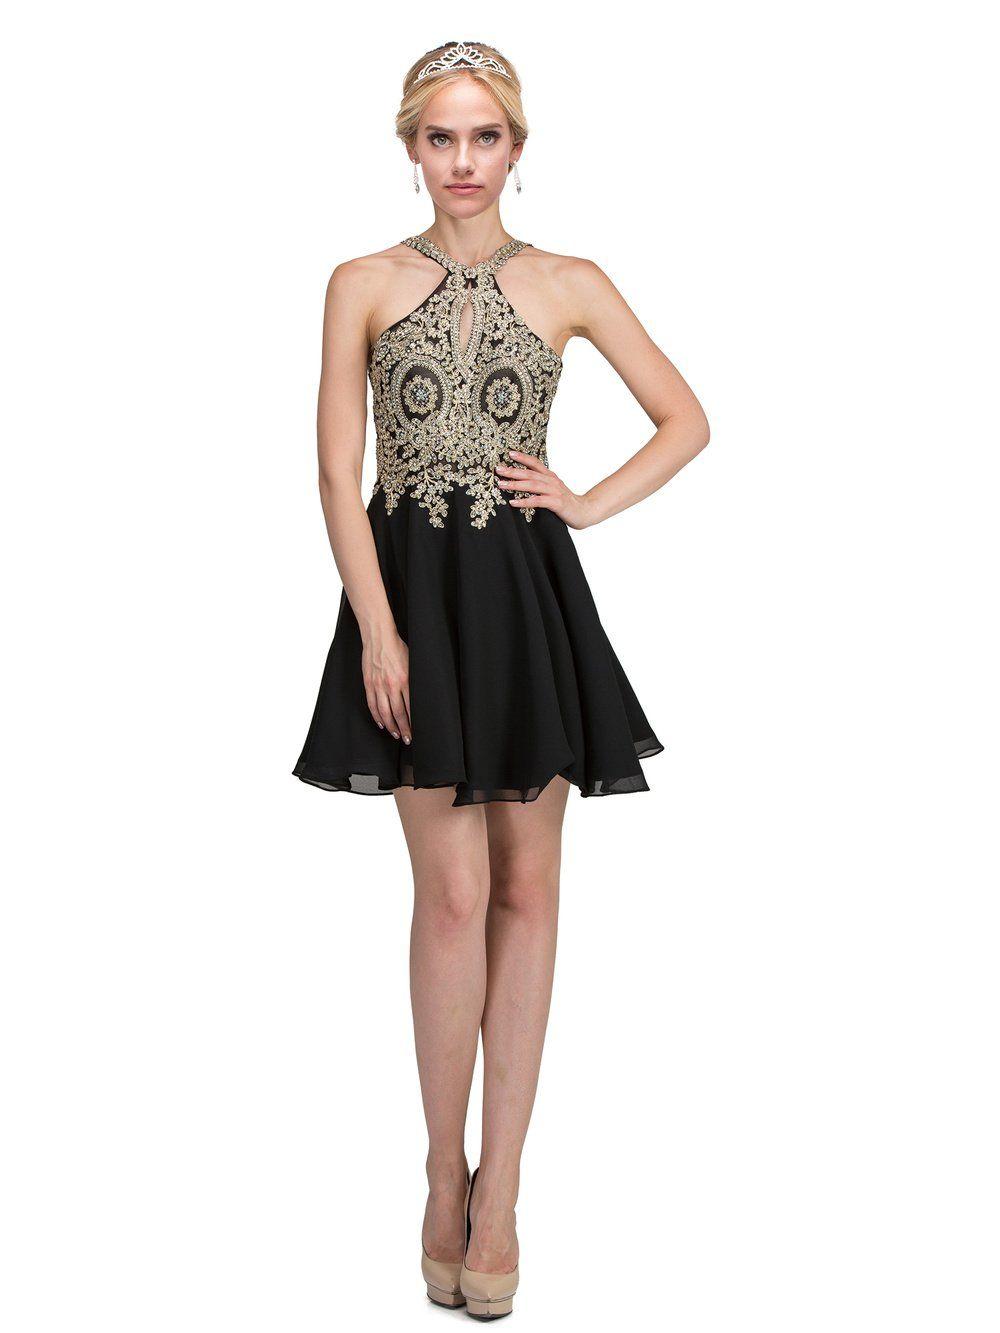 MQ 1646 - High Neck Embellished Bodice Short Chiffon Skirt